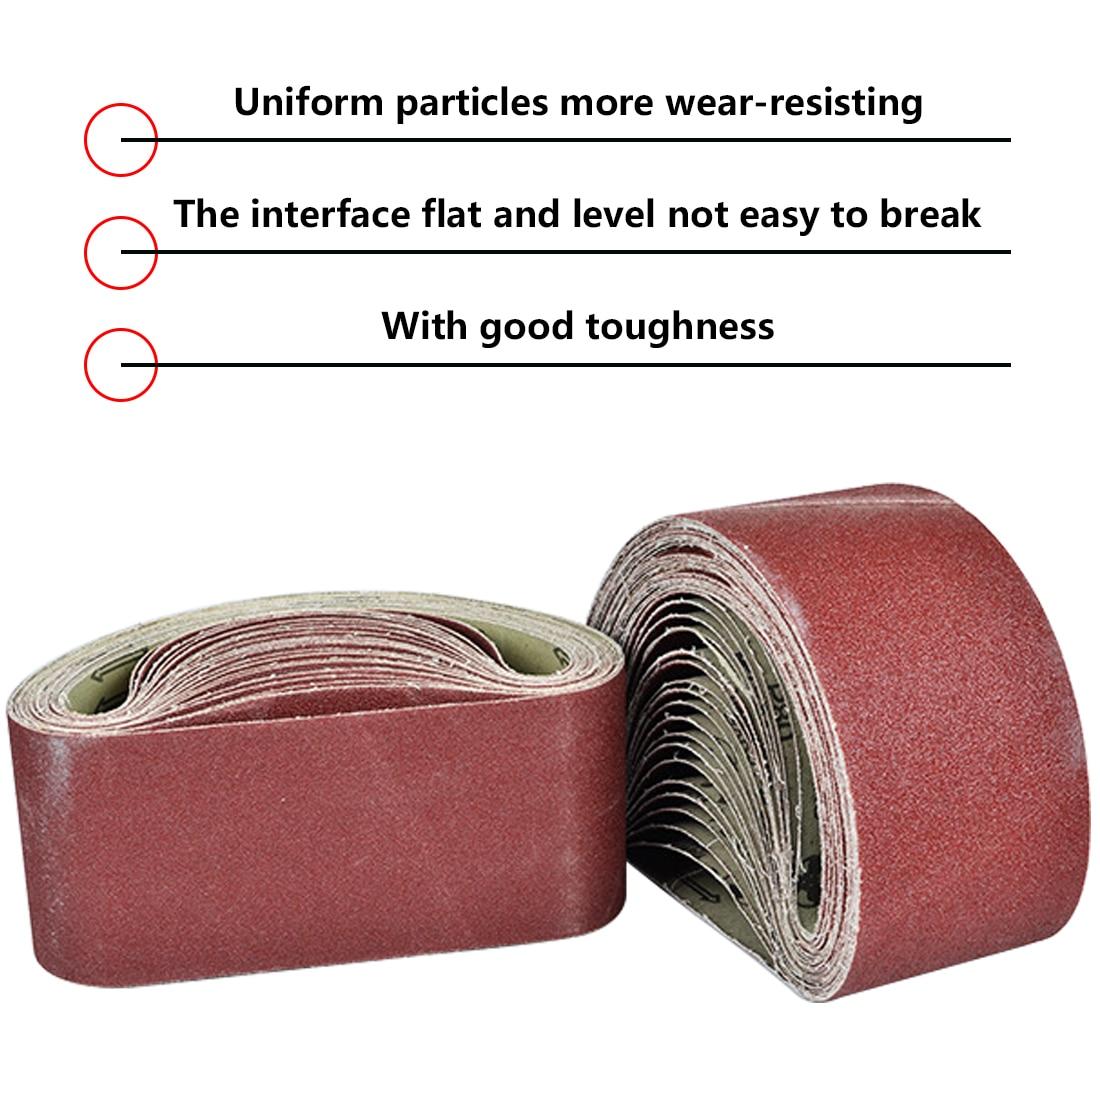 533x75mm Sanding Belts 80-320 Grits Sandpaper Abrasive Bands For Sander Power Rotary Tools Dremel Accessories Abrasive Tool